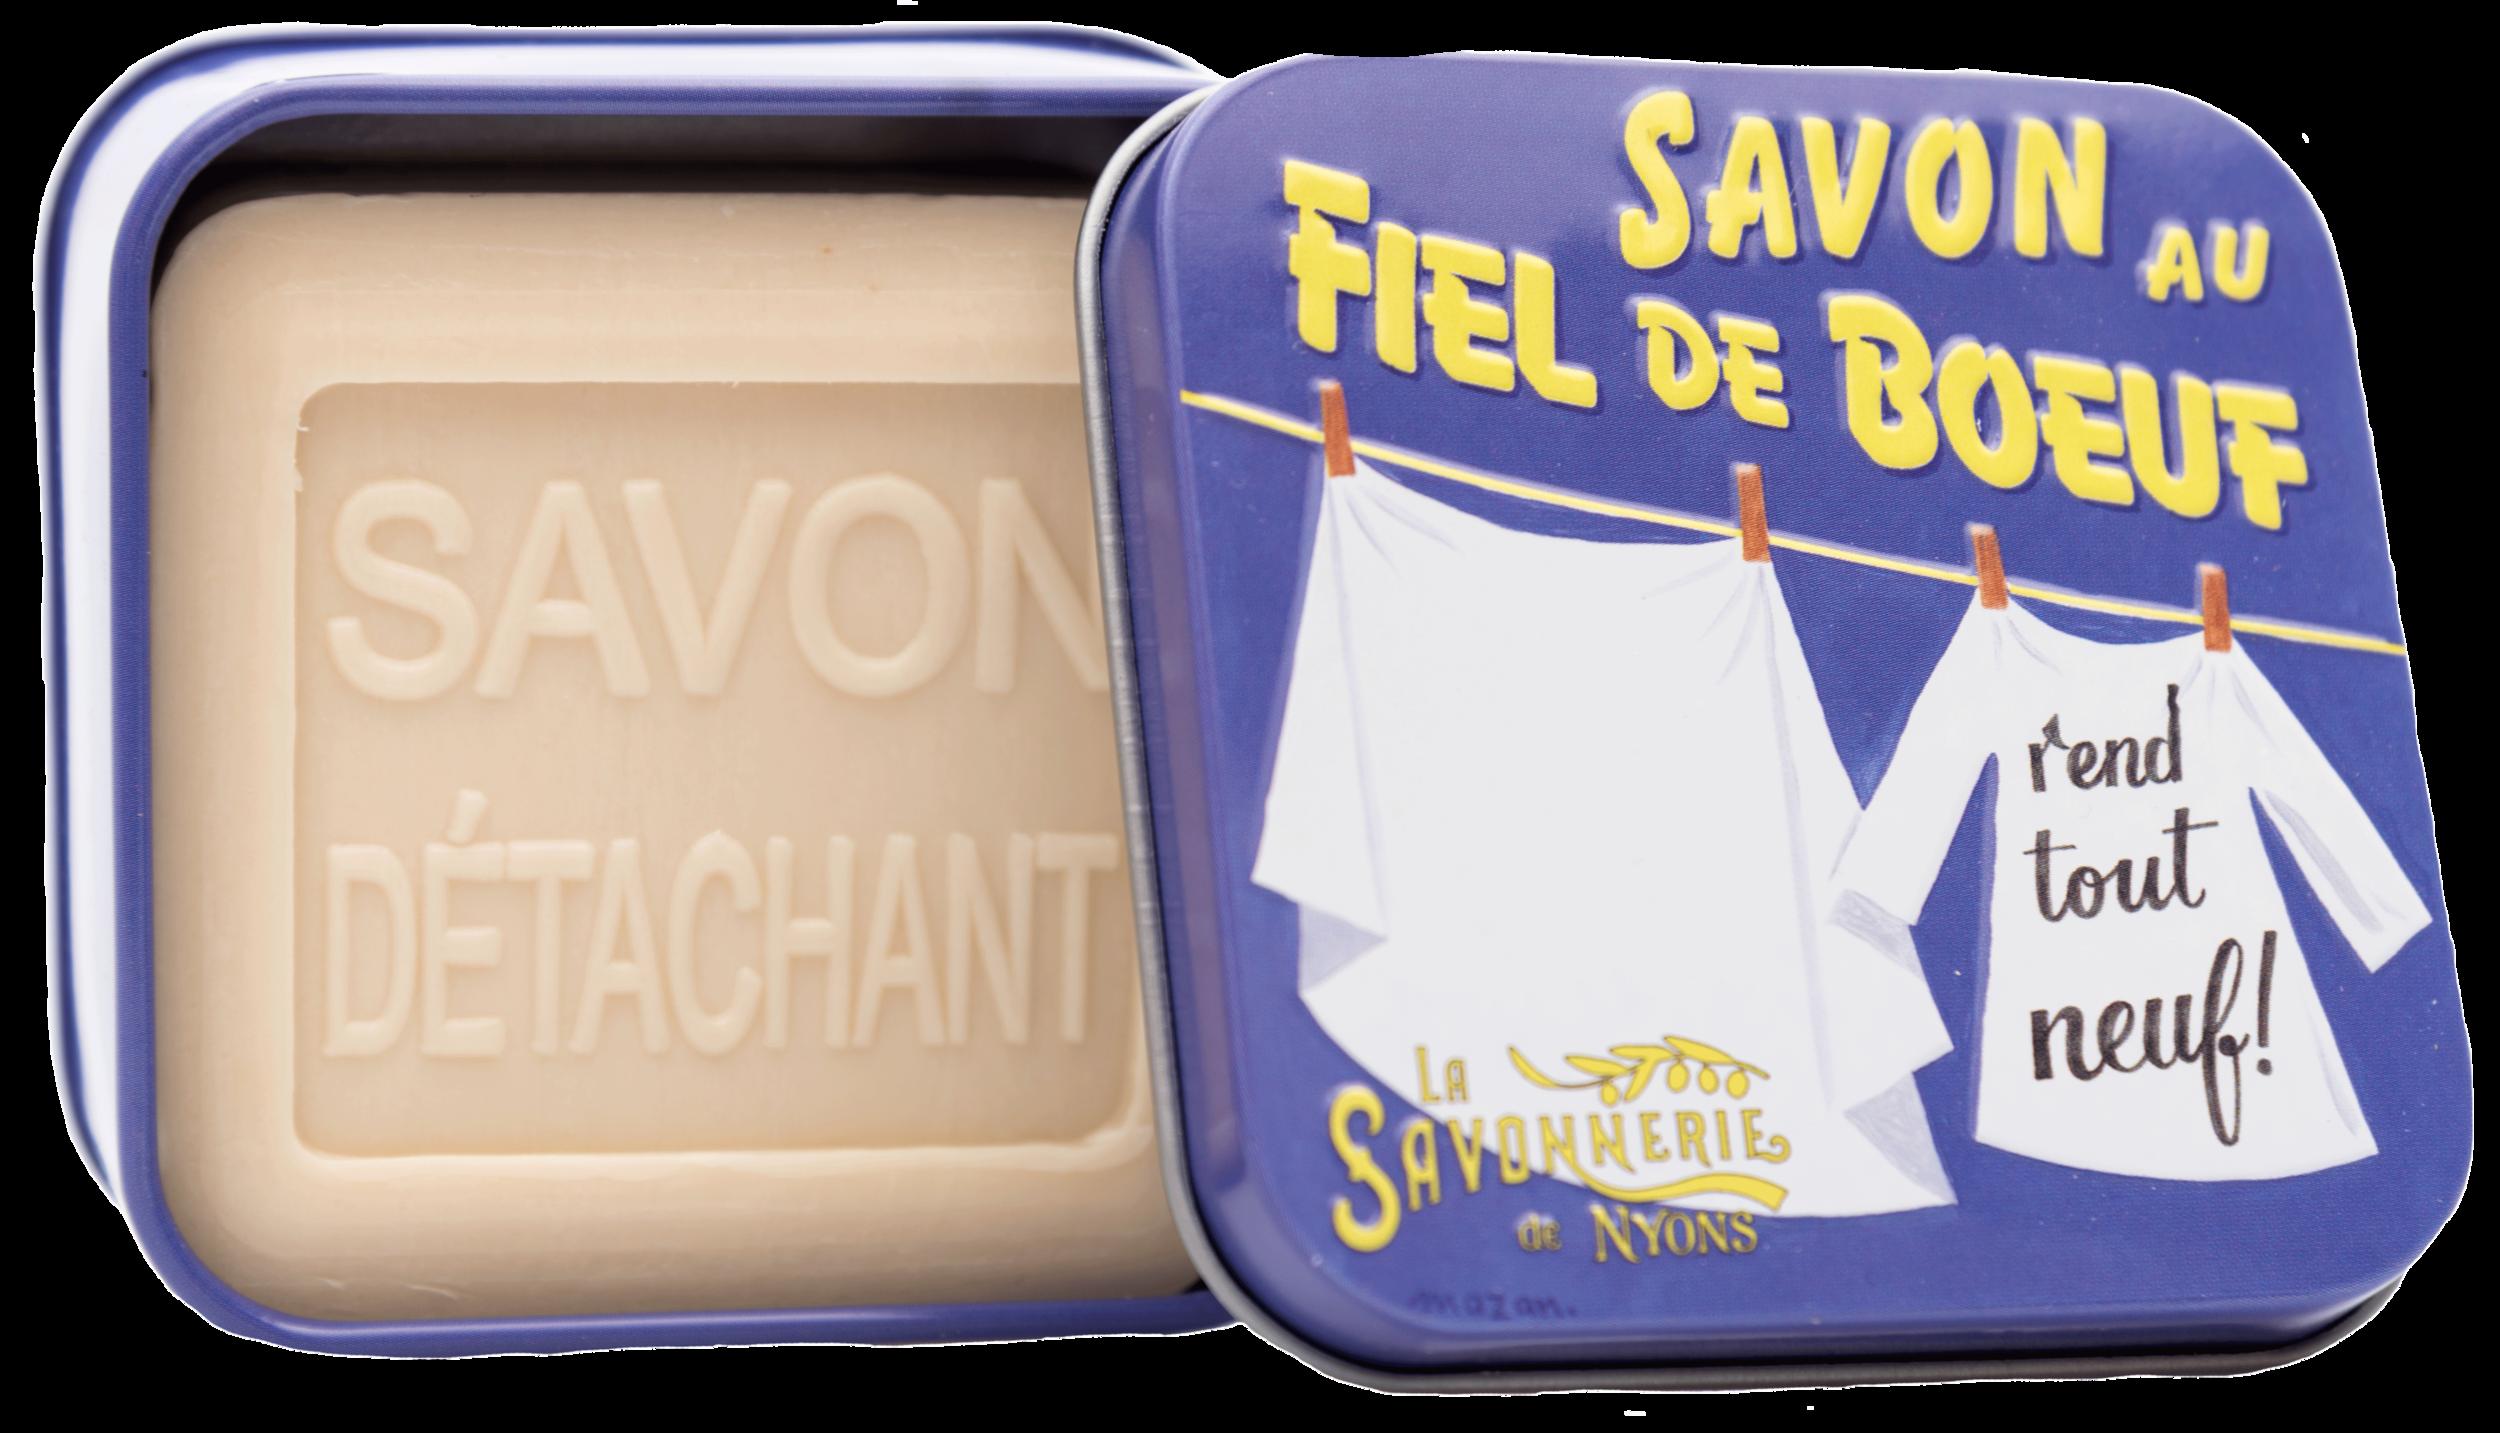 Boîte Métal & Savon Détachant 100 g